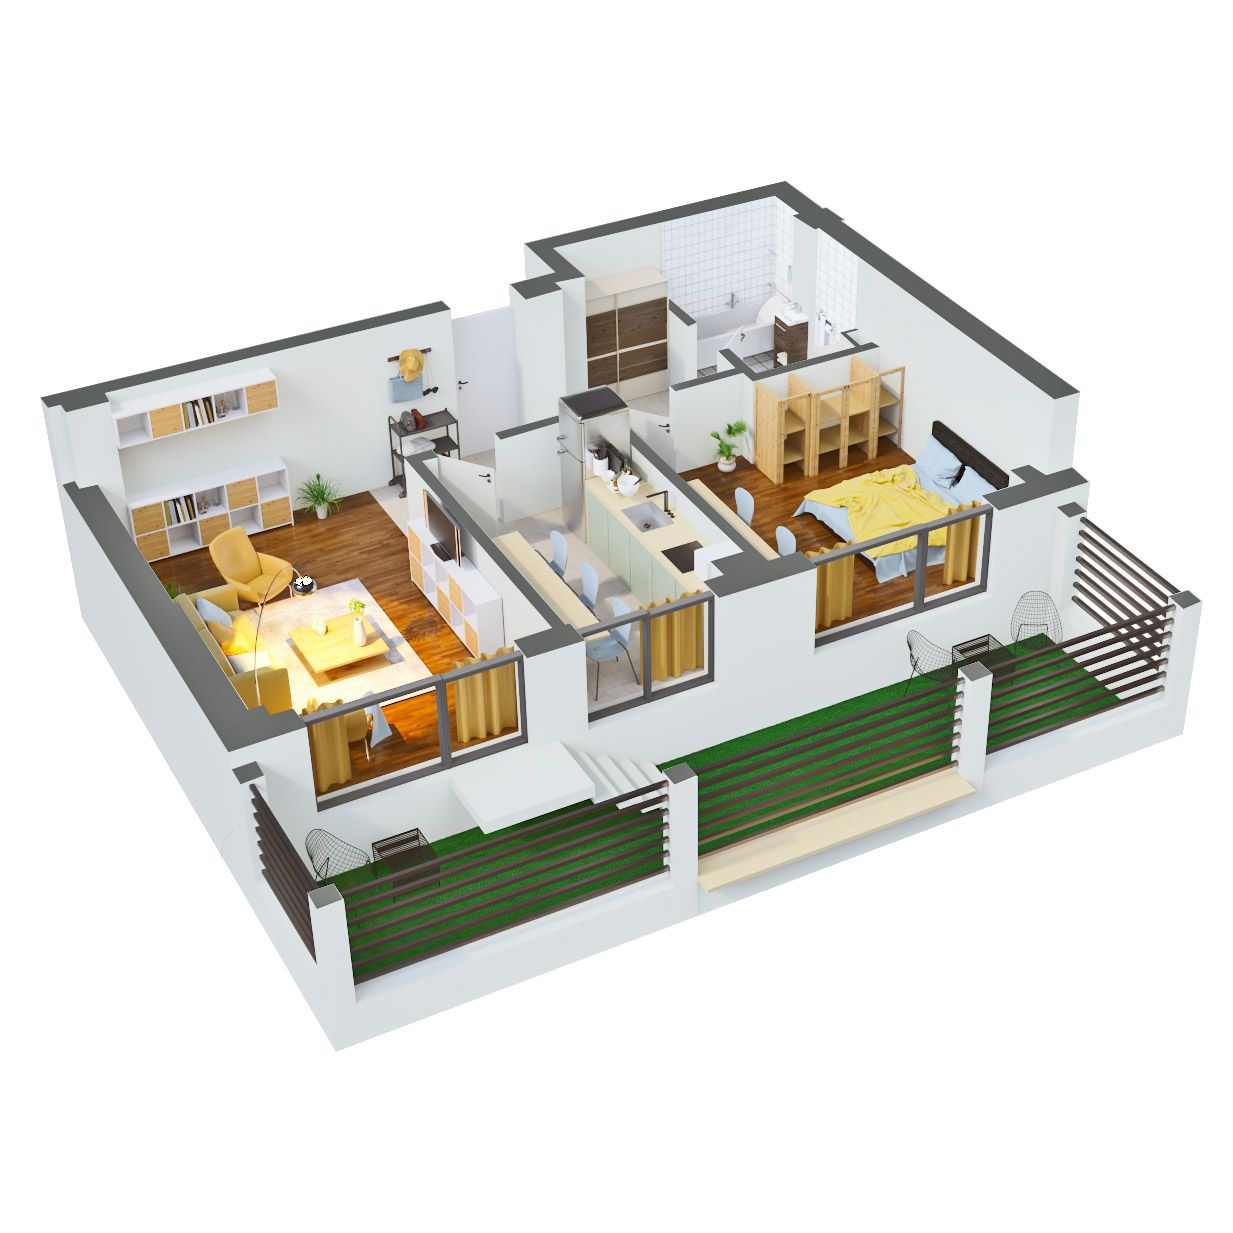 Apartament 2 camere de vanzare Bucuresti - Catedral Residence - Marriott, Piata Unirii, 13 Septembrie, Izvor - Tip 5 - T2 - A